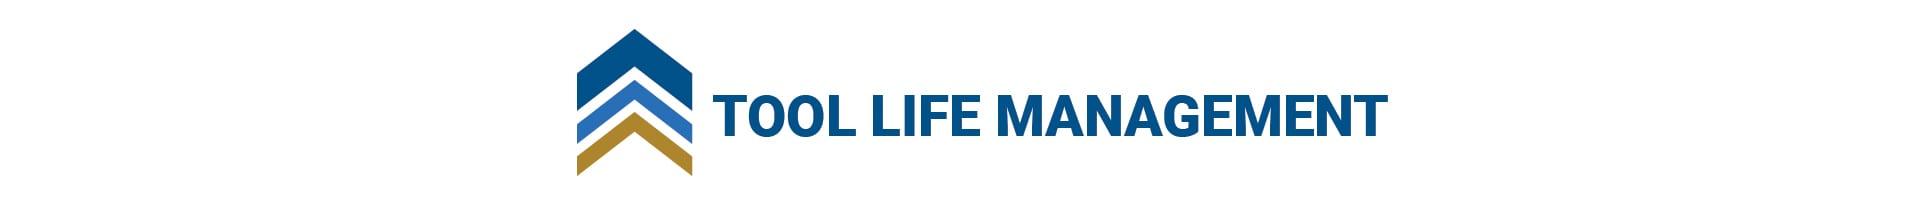 Tool-Life-Management-BAR